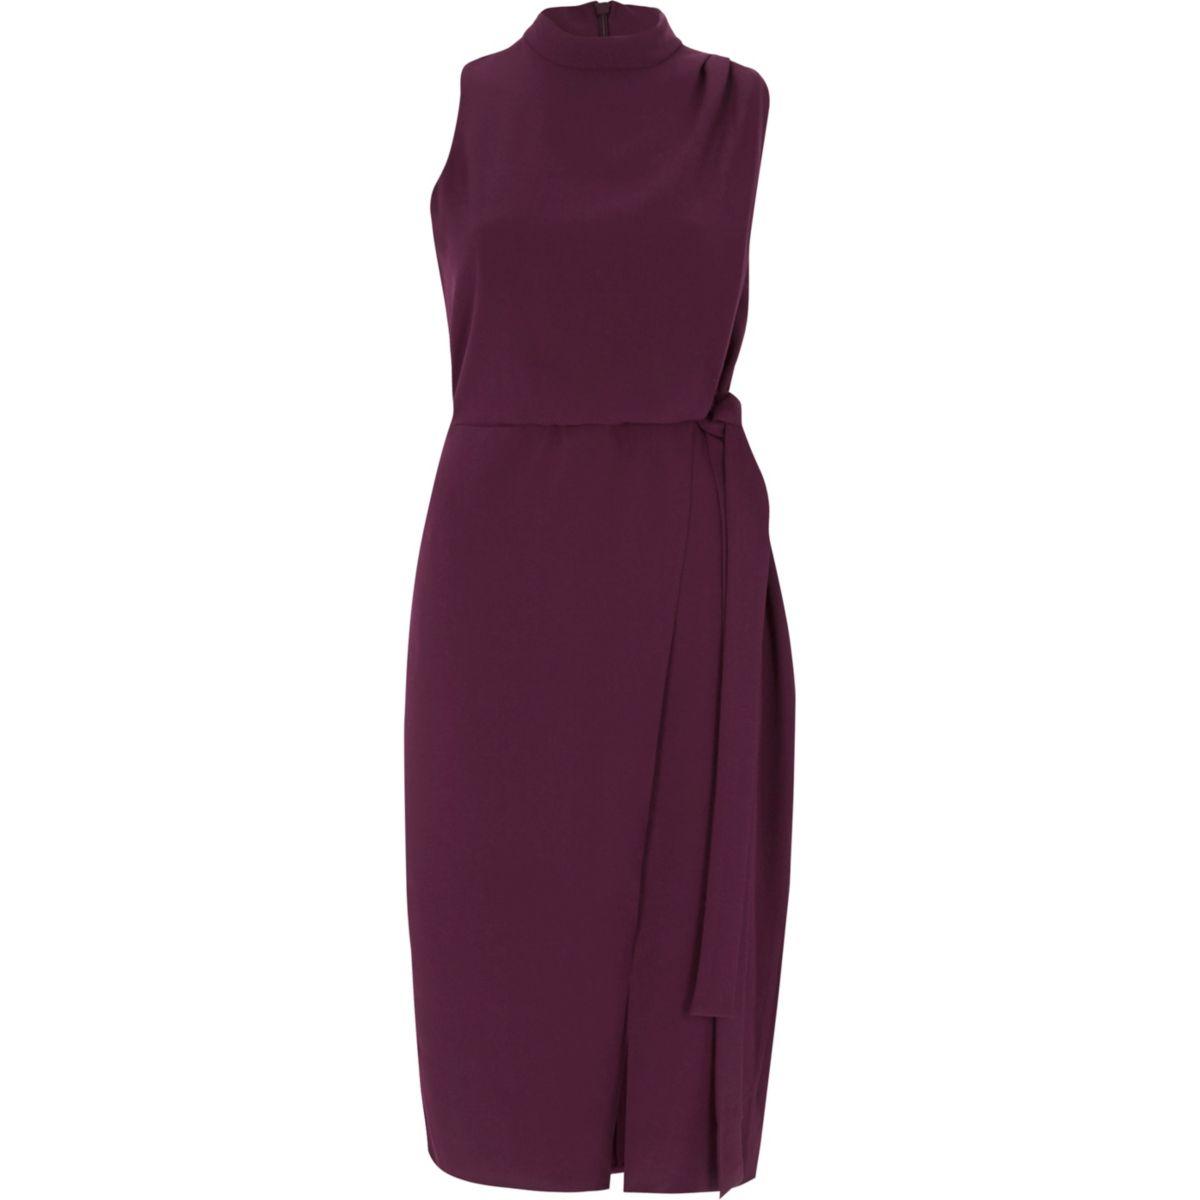 Dark purple high neck sleeveless wrap dress